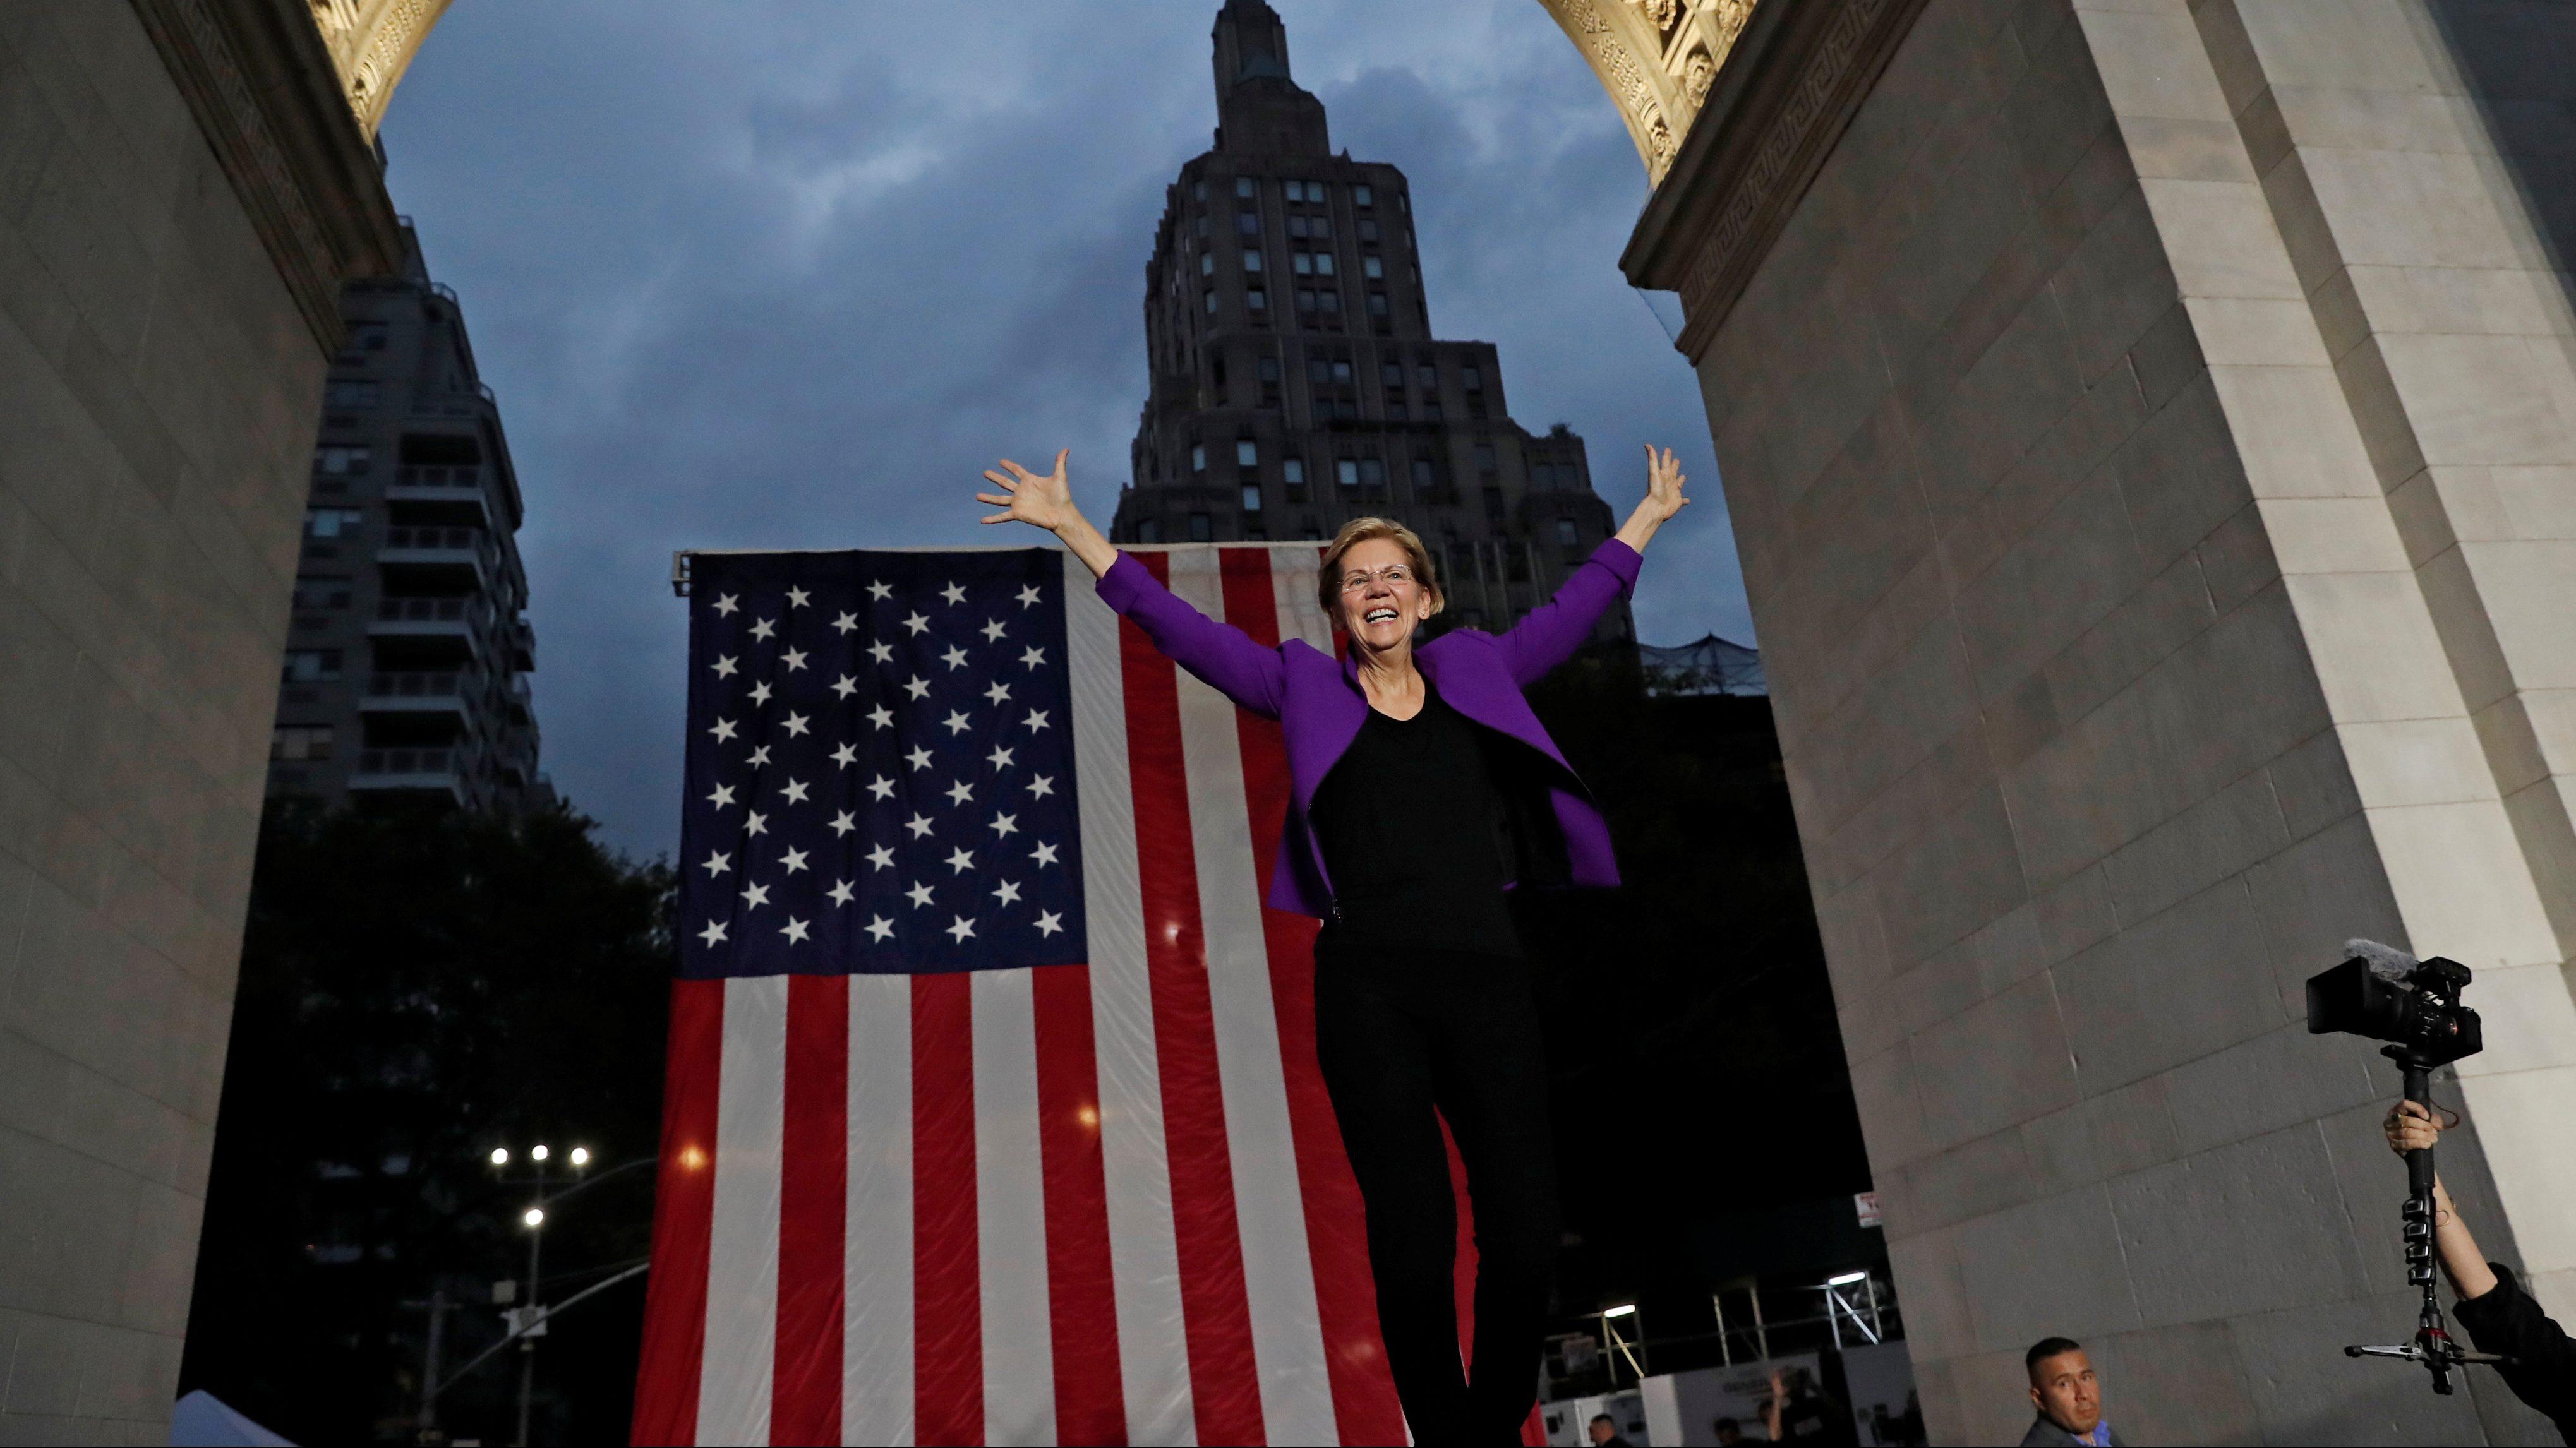 U.S. Senator and democratic presidential candidate Elizabeth Warren arrives to speak at Washington Square Park in New York